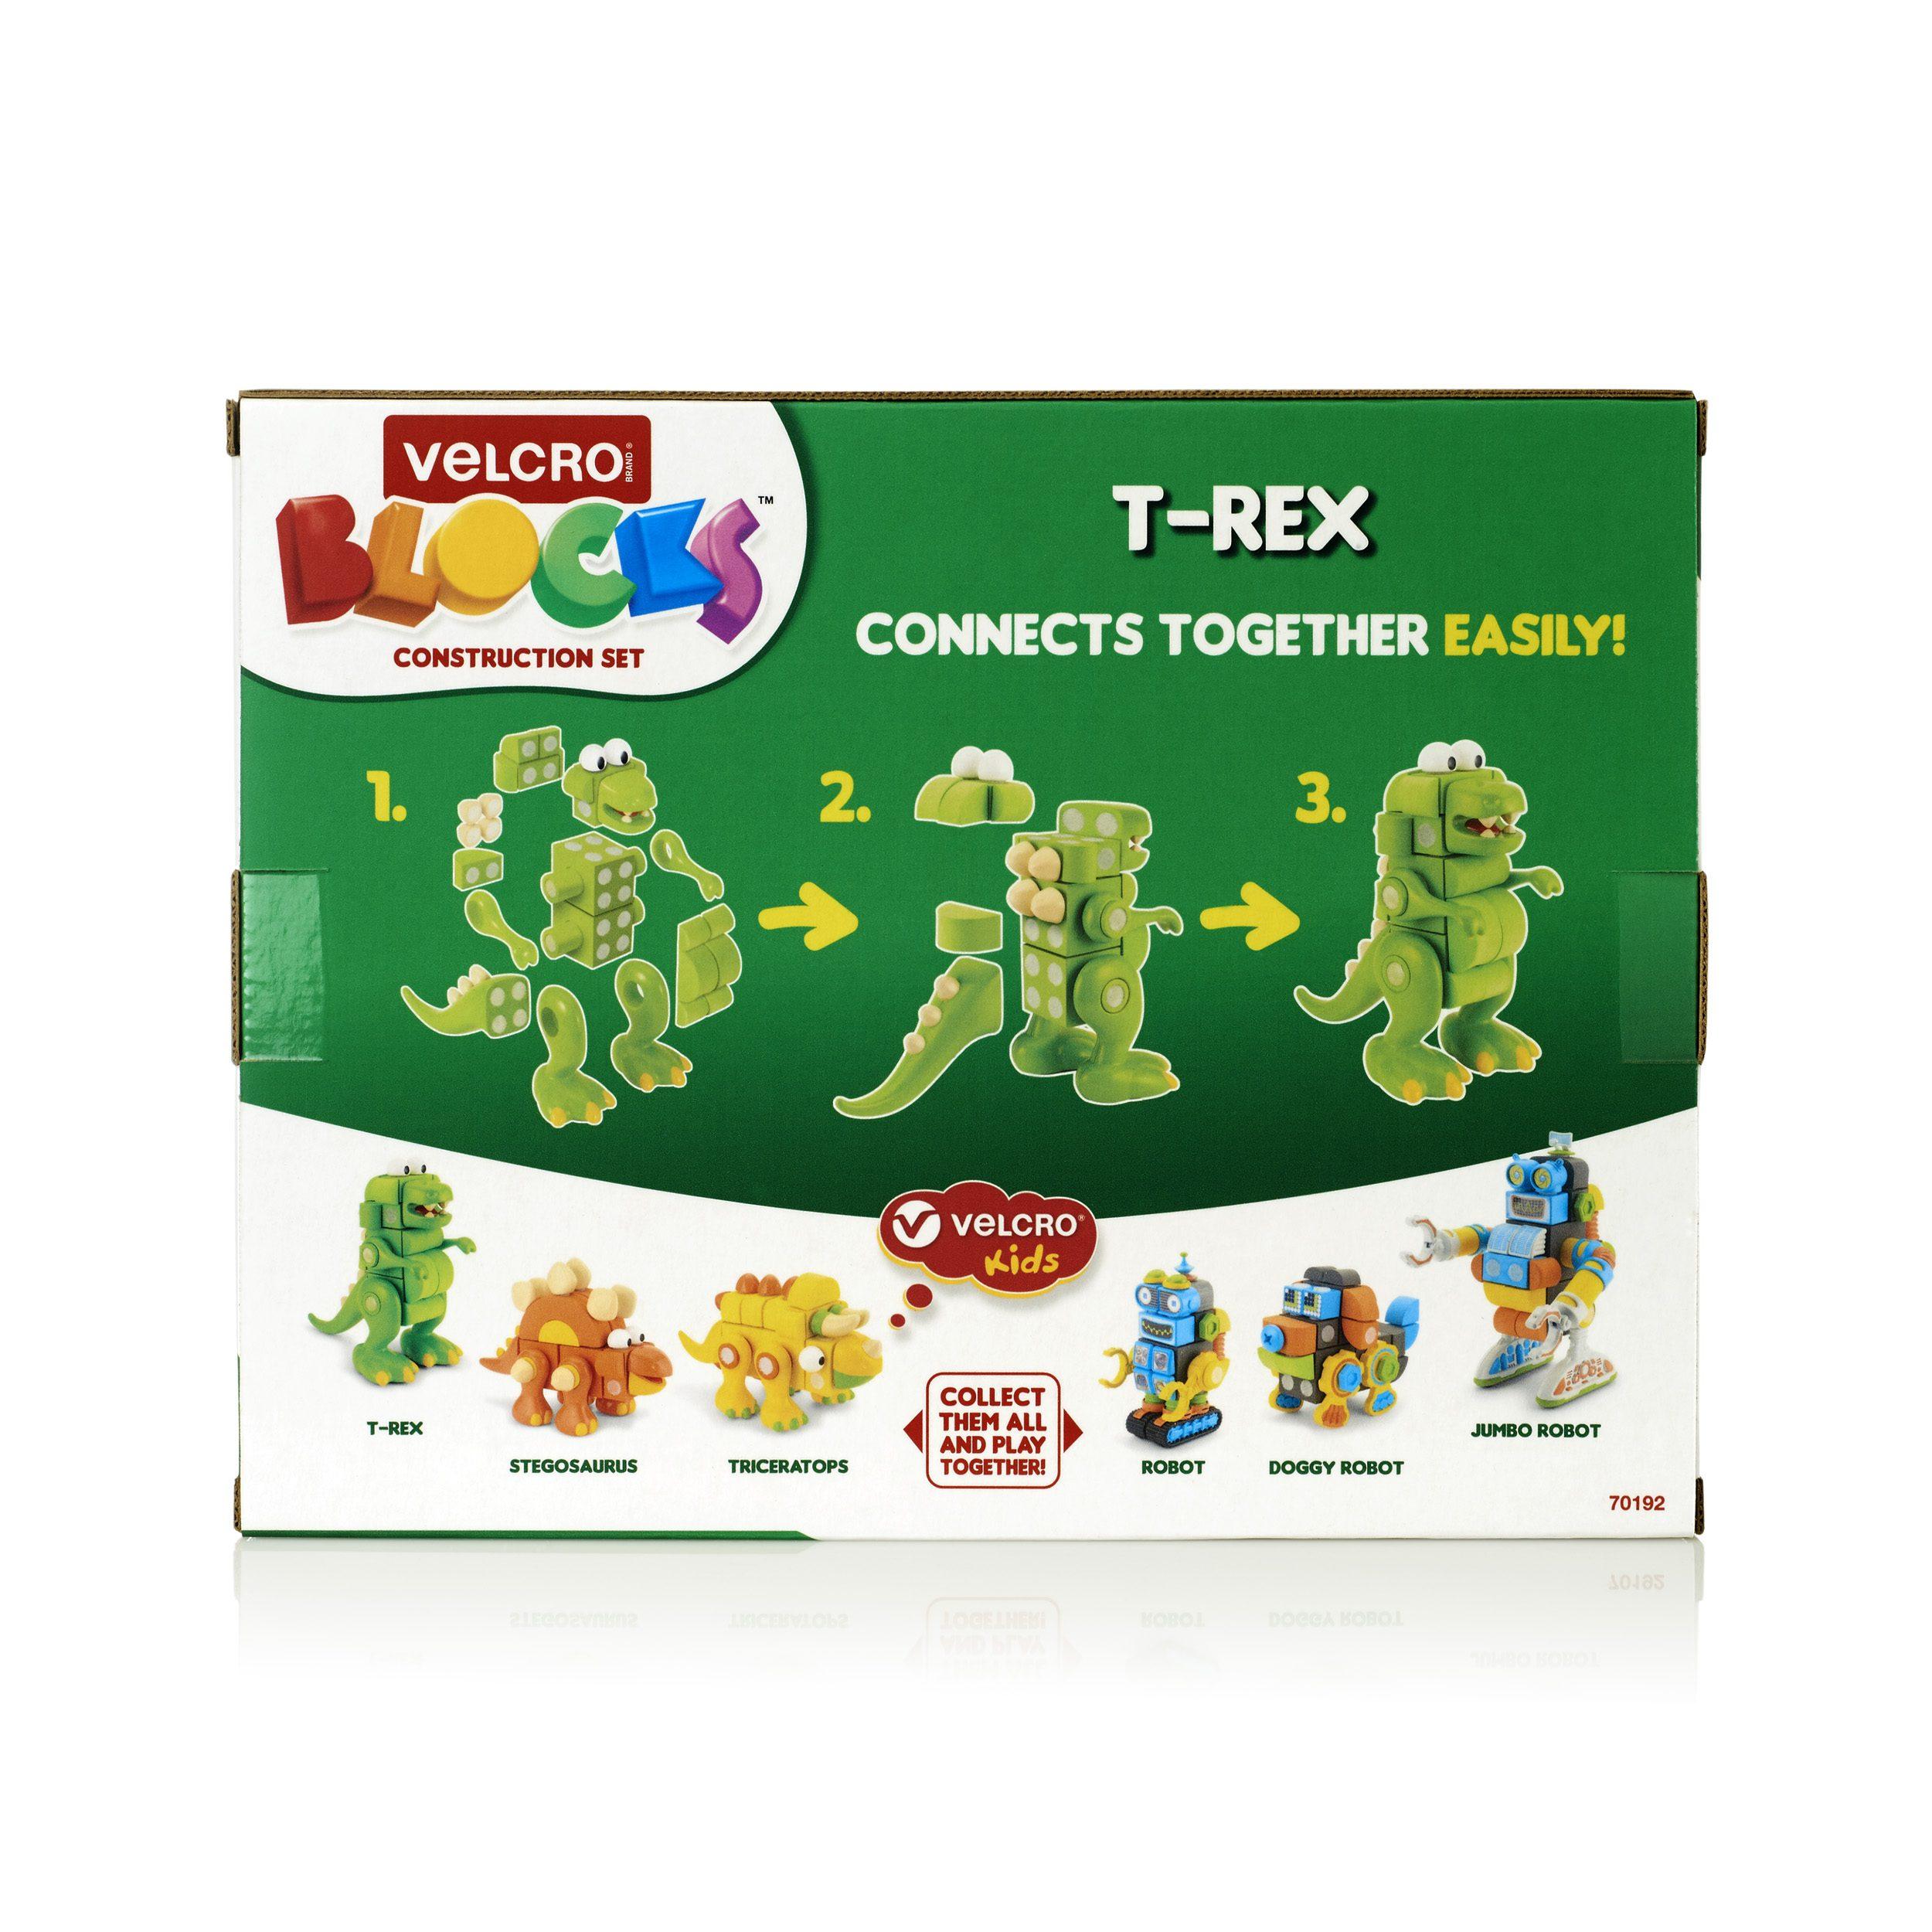 Lego ® Technic Bras Levage Beam Axleholes Choose Color ref 44137